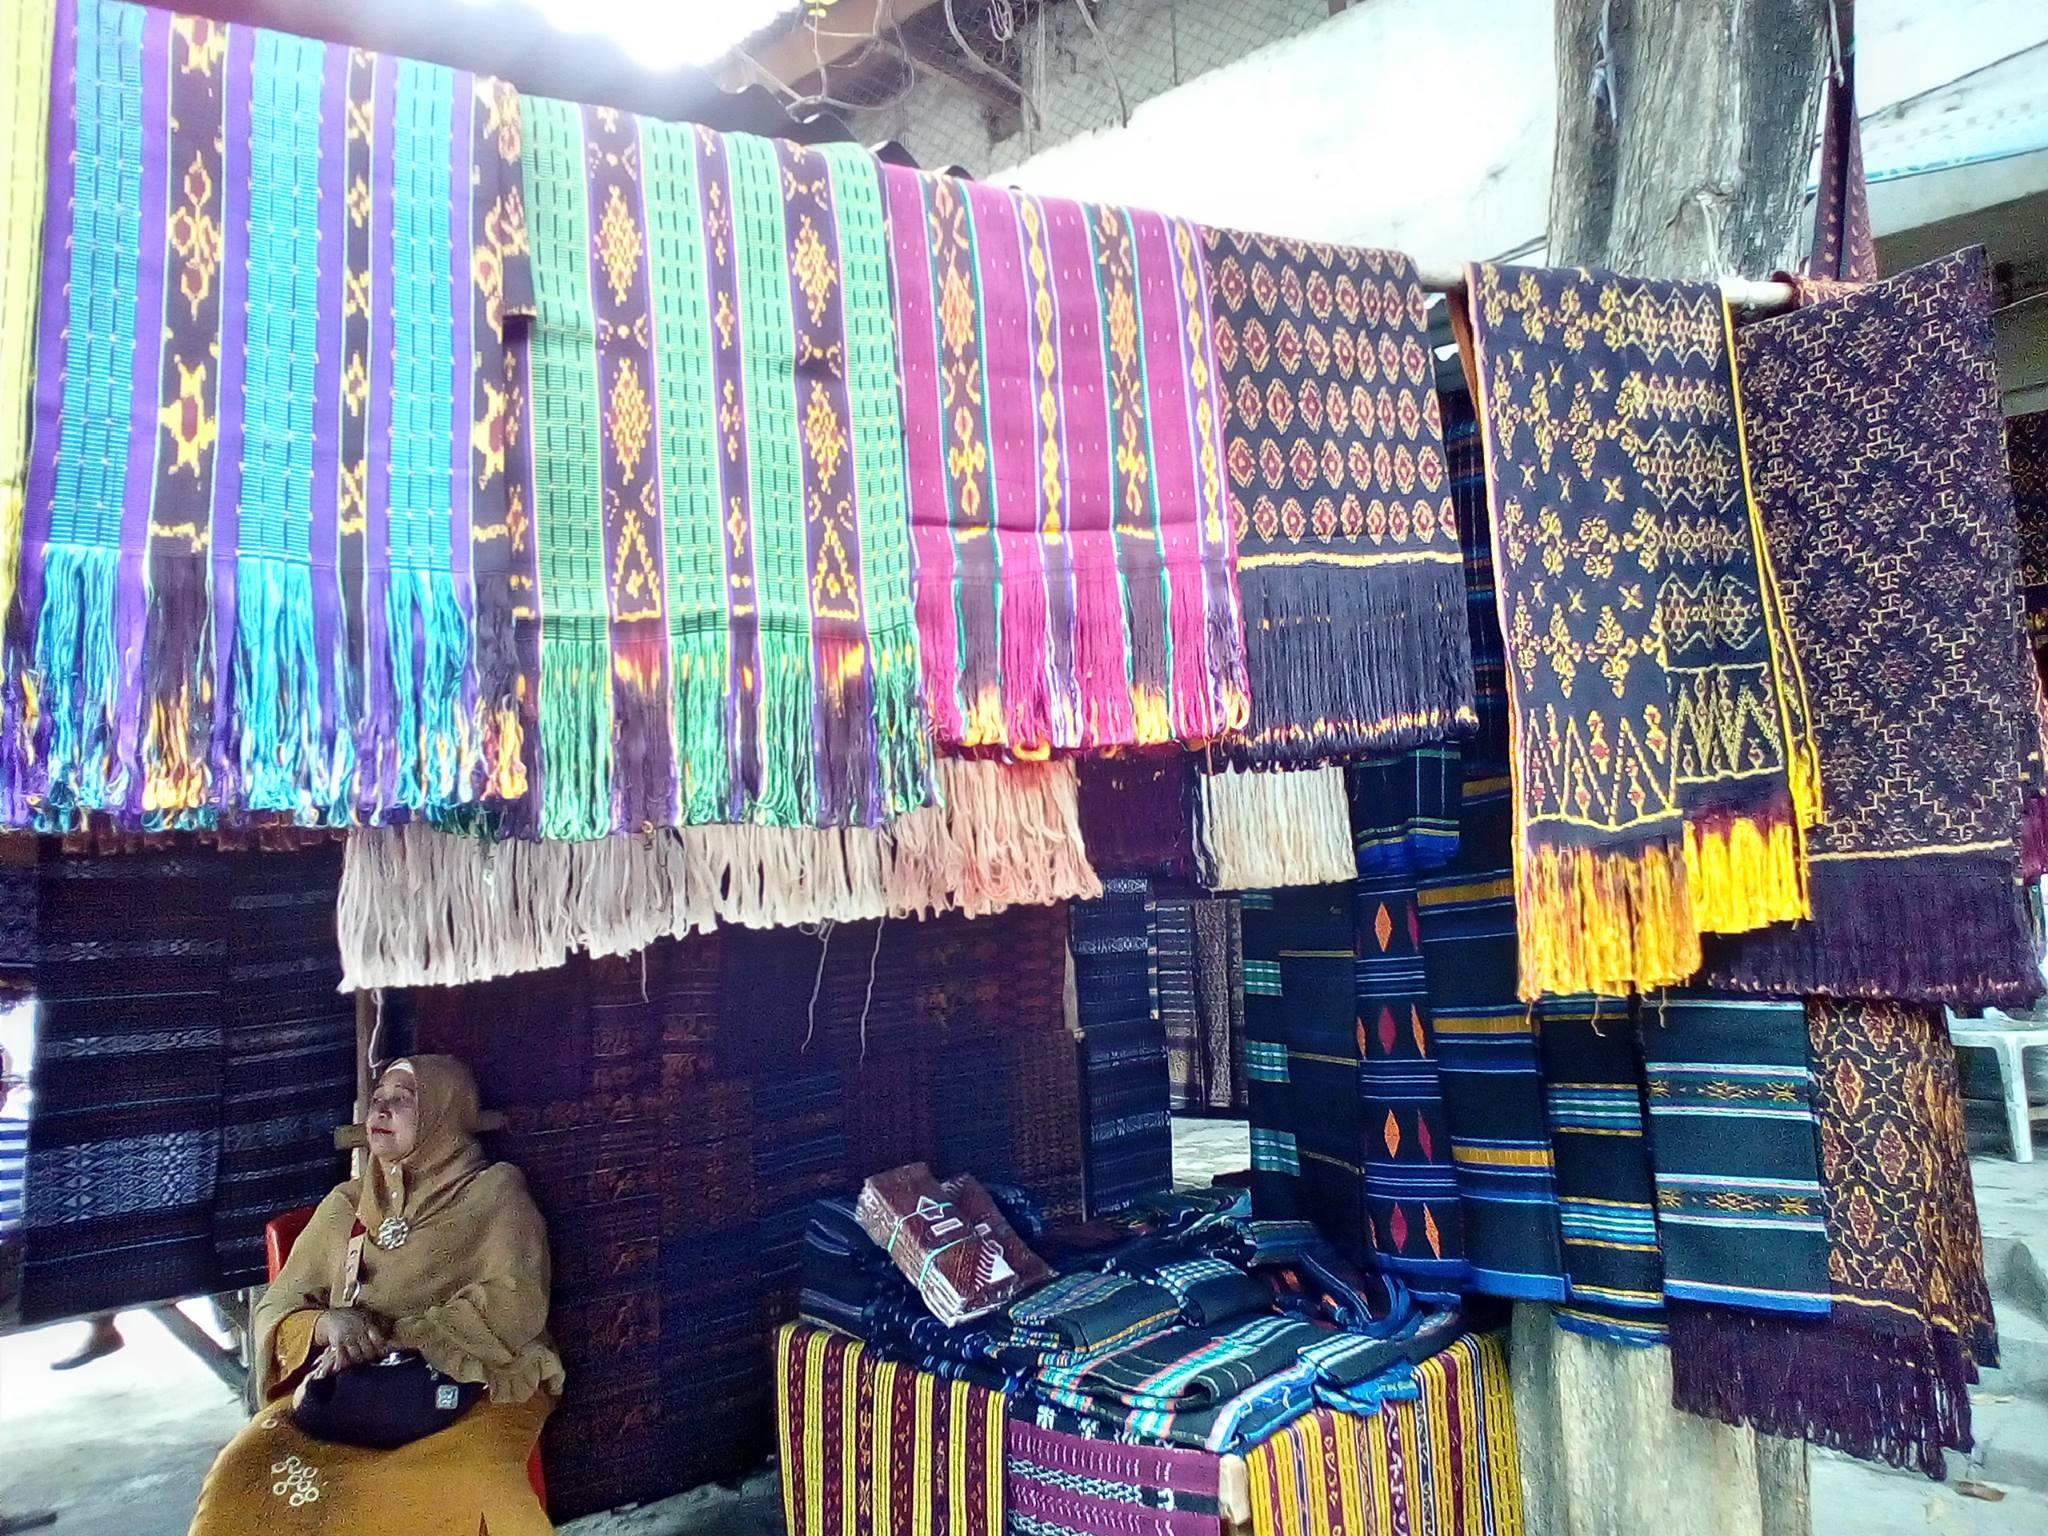 Tenun ikat from various villages around Nusa Tenggara Timur - UniBRIDGE